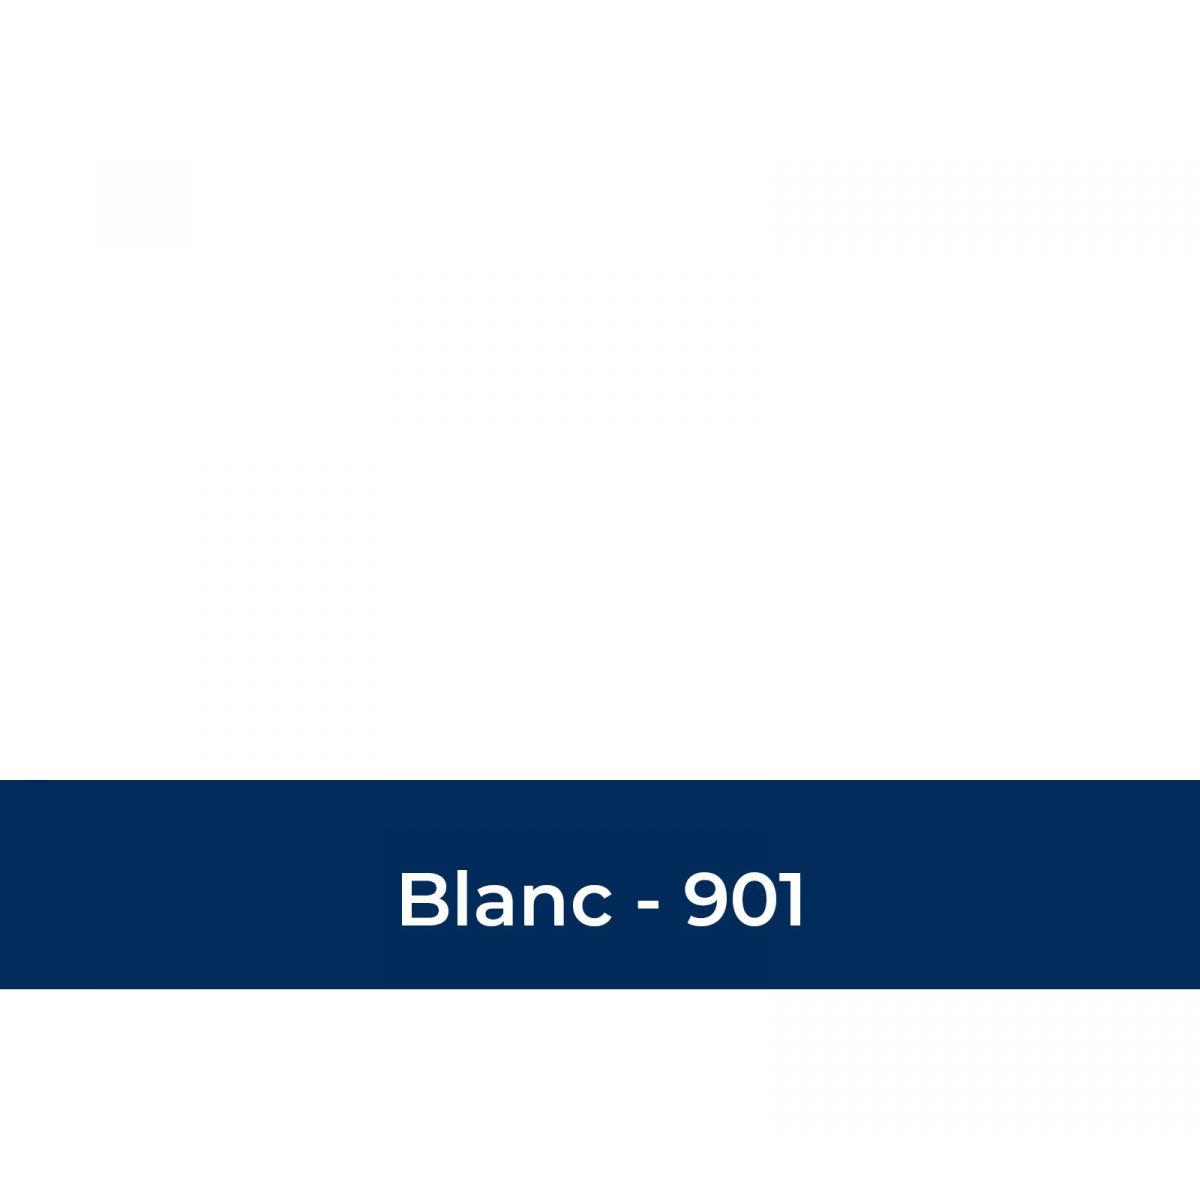 Transign blanc 901